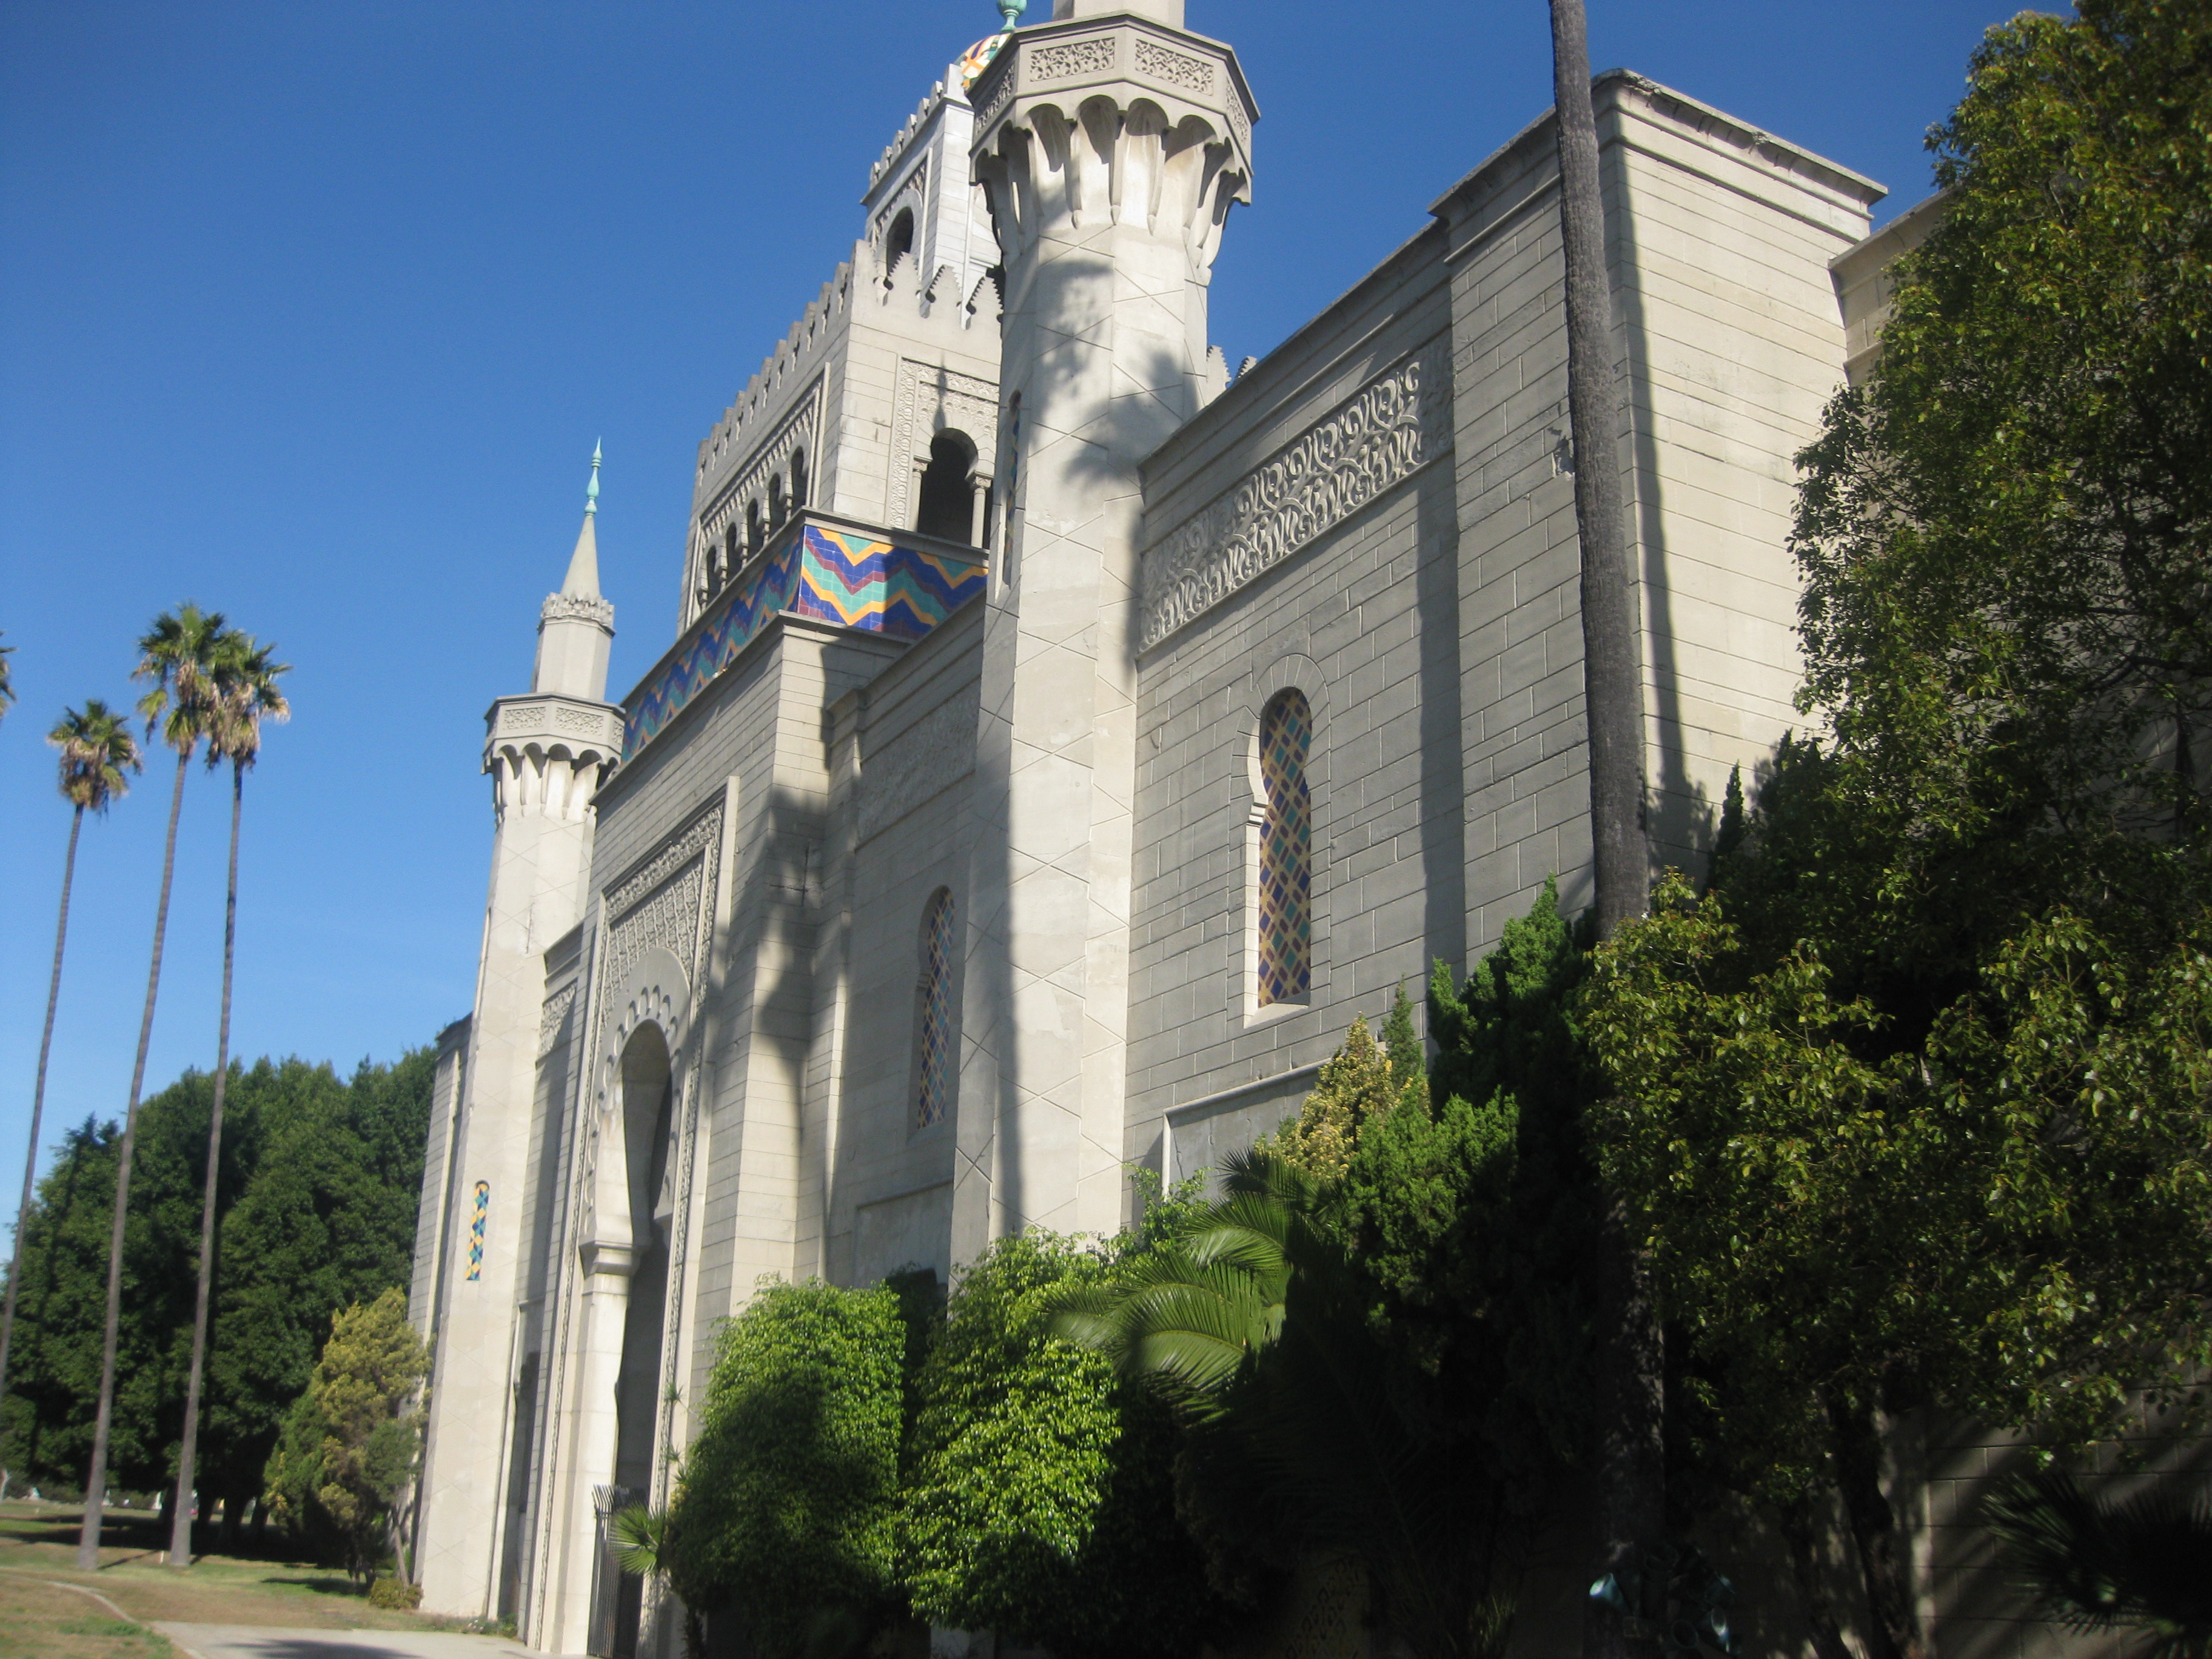 Angeles Abbey Memorial Park